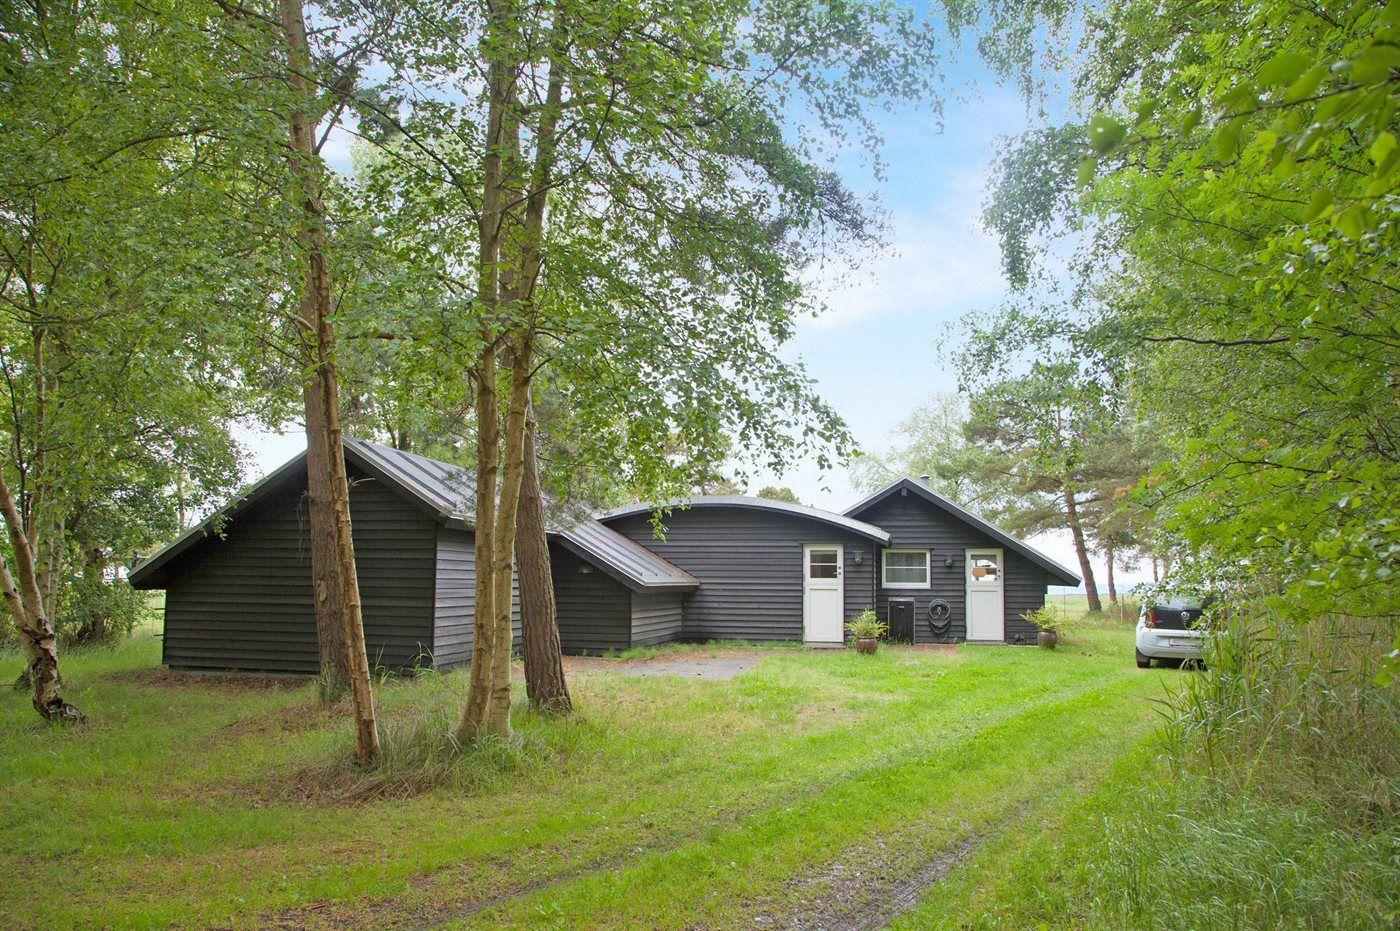 Dein Ferienhaus Dänemark.de Ferienhaus dänemark